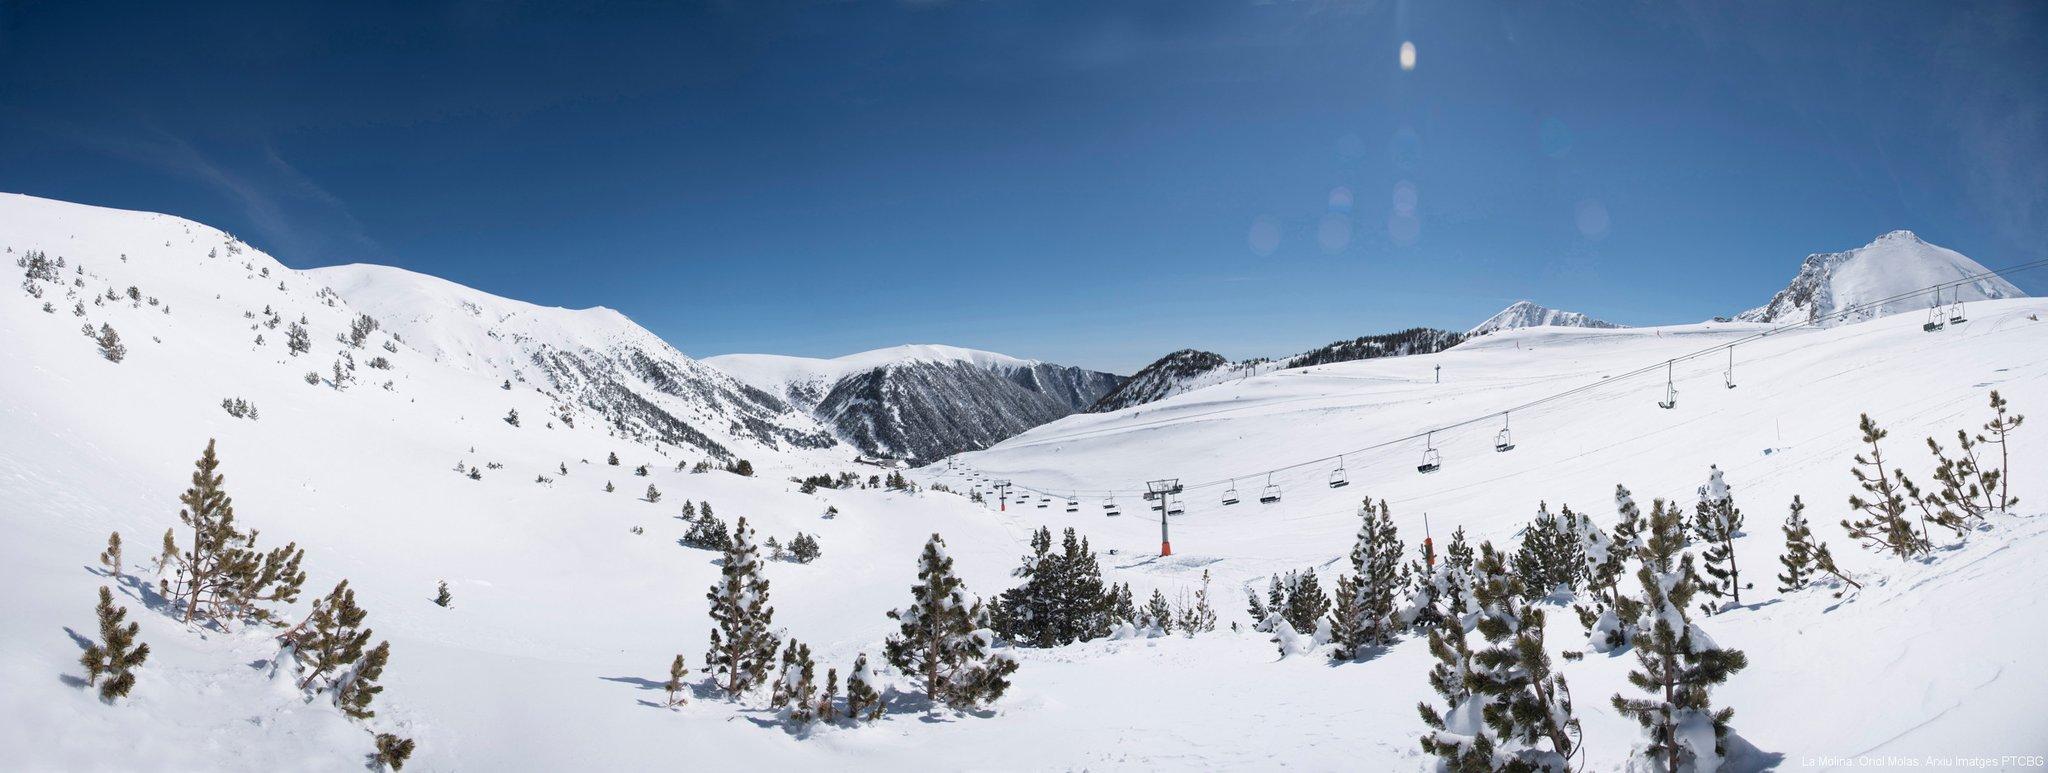 Happy World Snow Day! ❄🙌💥🎉  Where are you going to enjoy the snow today?  #inPyrenees | @SnowLaMolina | @ValldeNuria | @Vallter2000 | @MasellaPirineu https://t.co/ojbgIz0Tvf